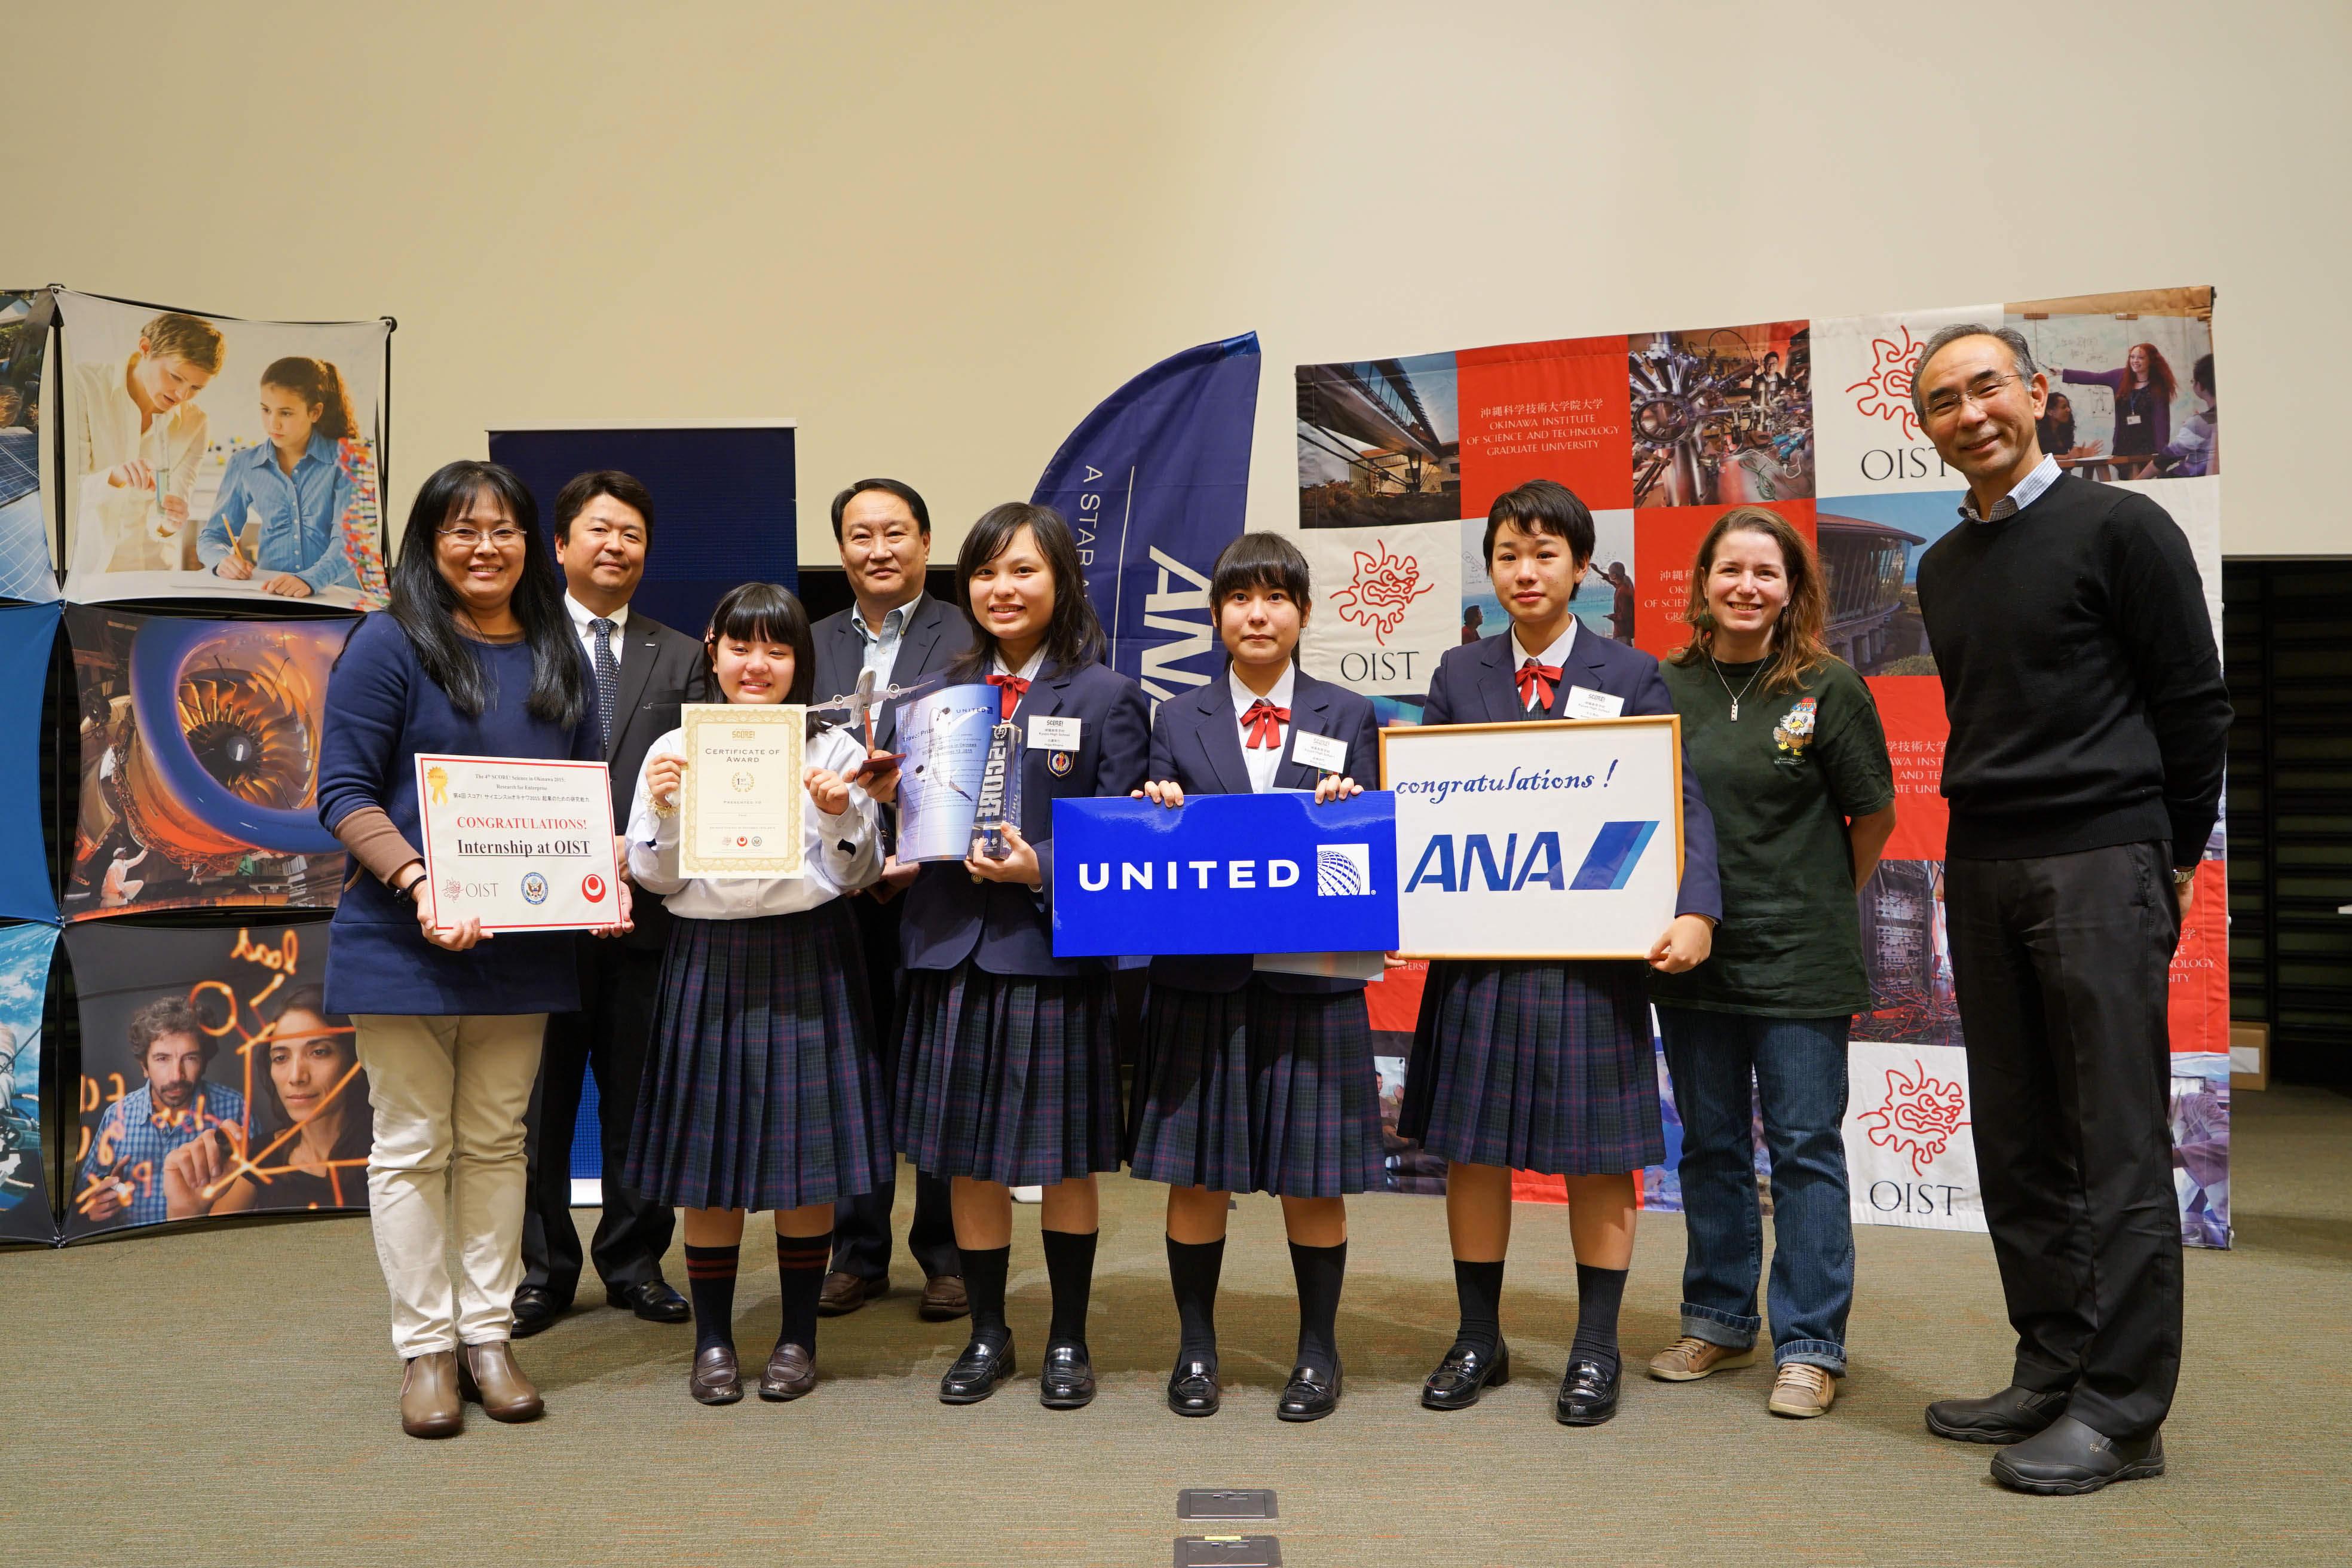 The winning team from Kyuyo High School